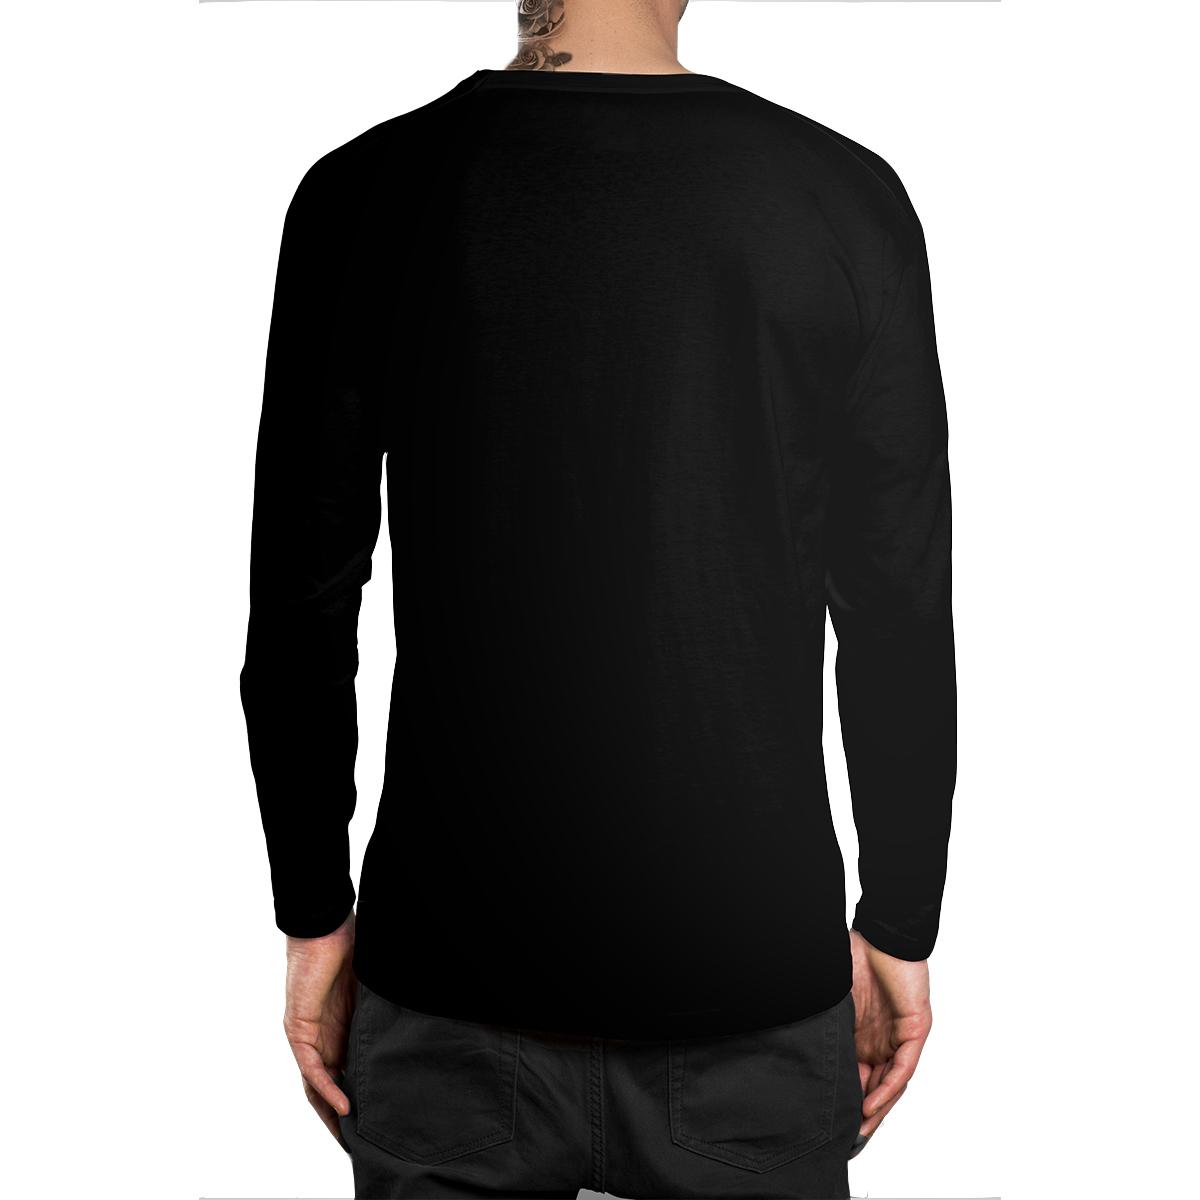 Stompy Camiseta Manga Longa Modelo 55